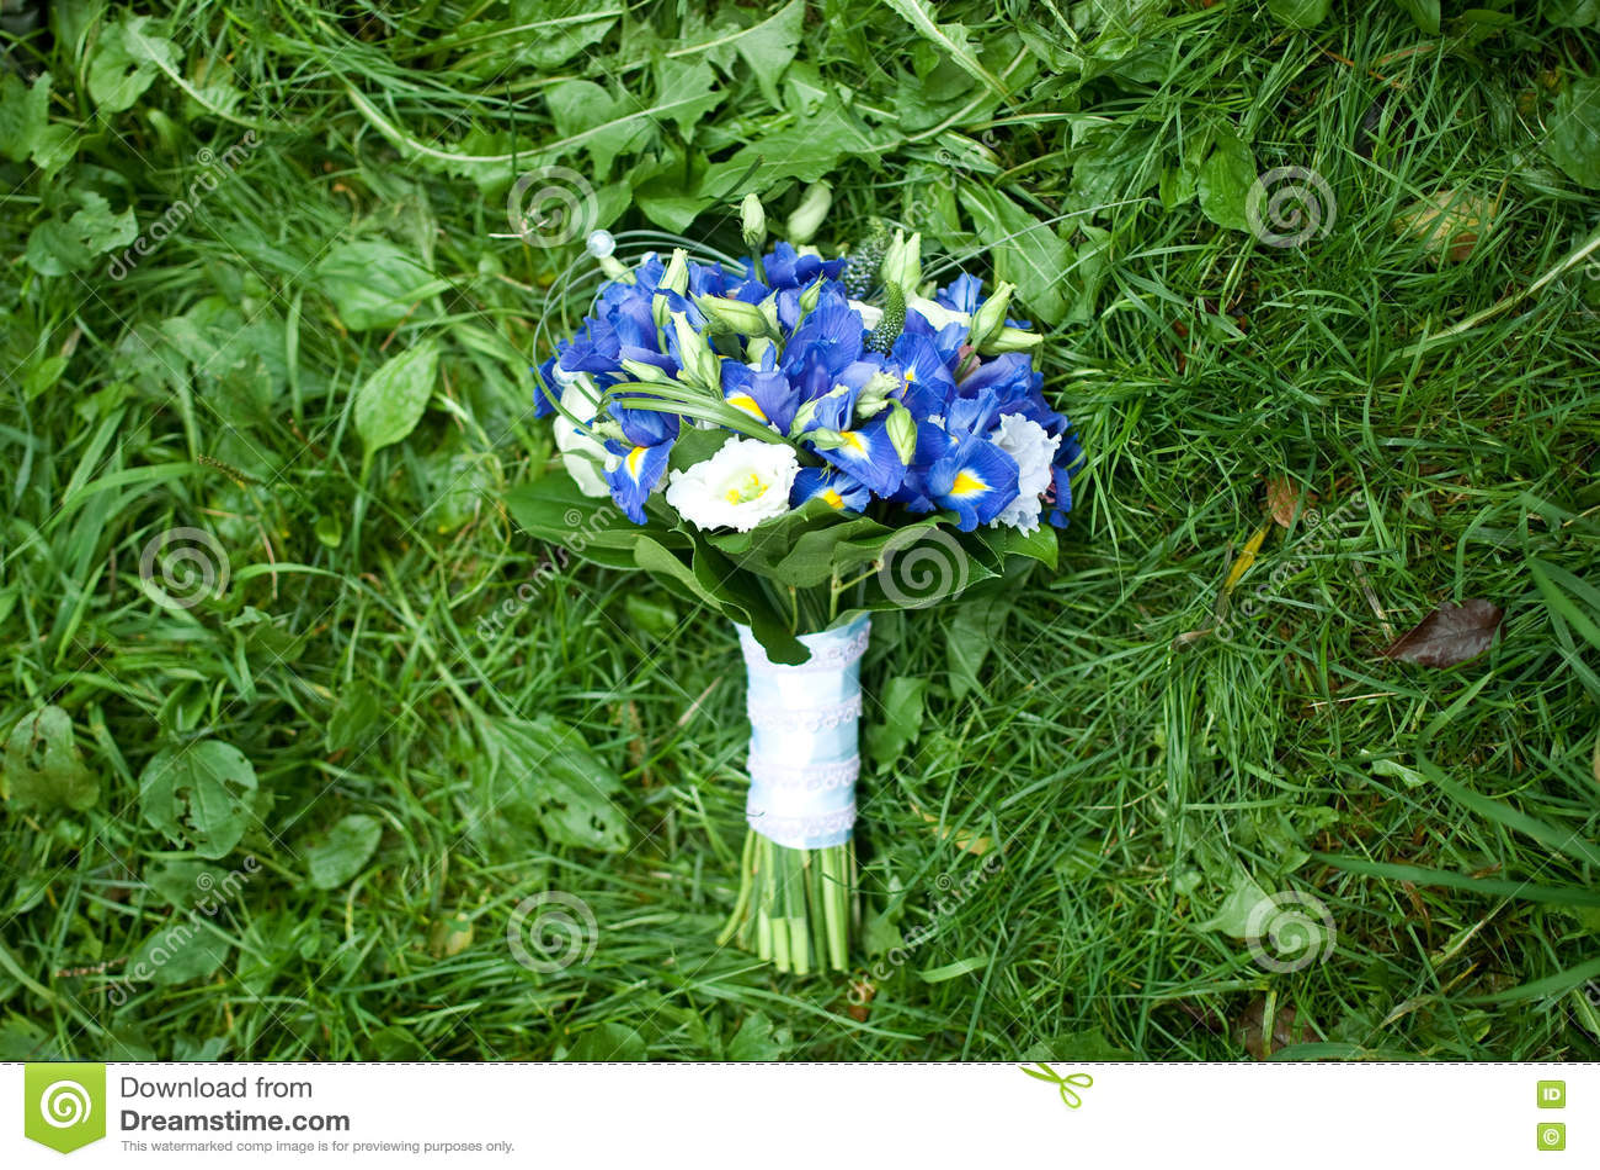 Lush blue wedding bouquet